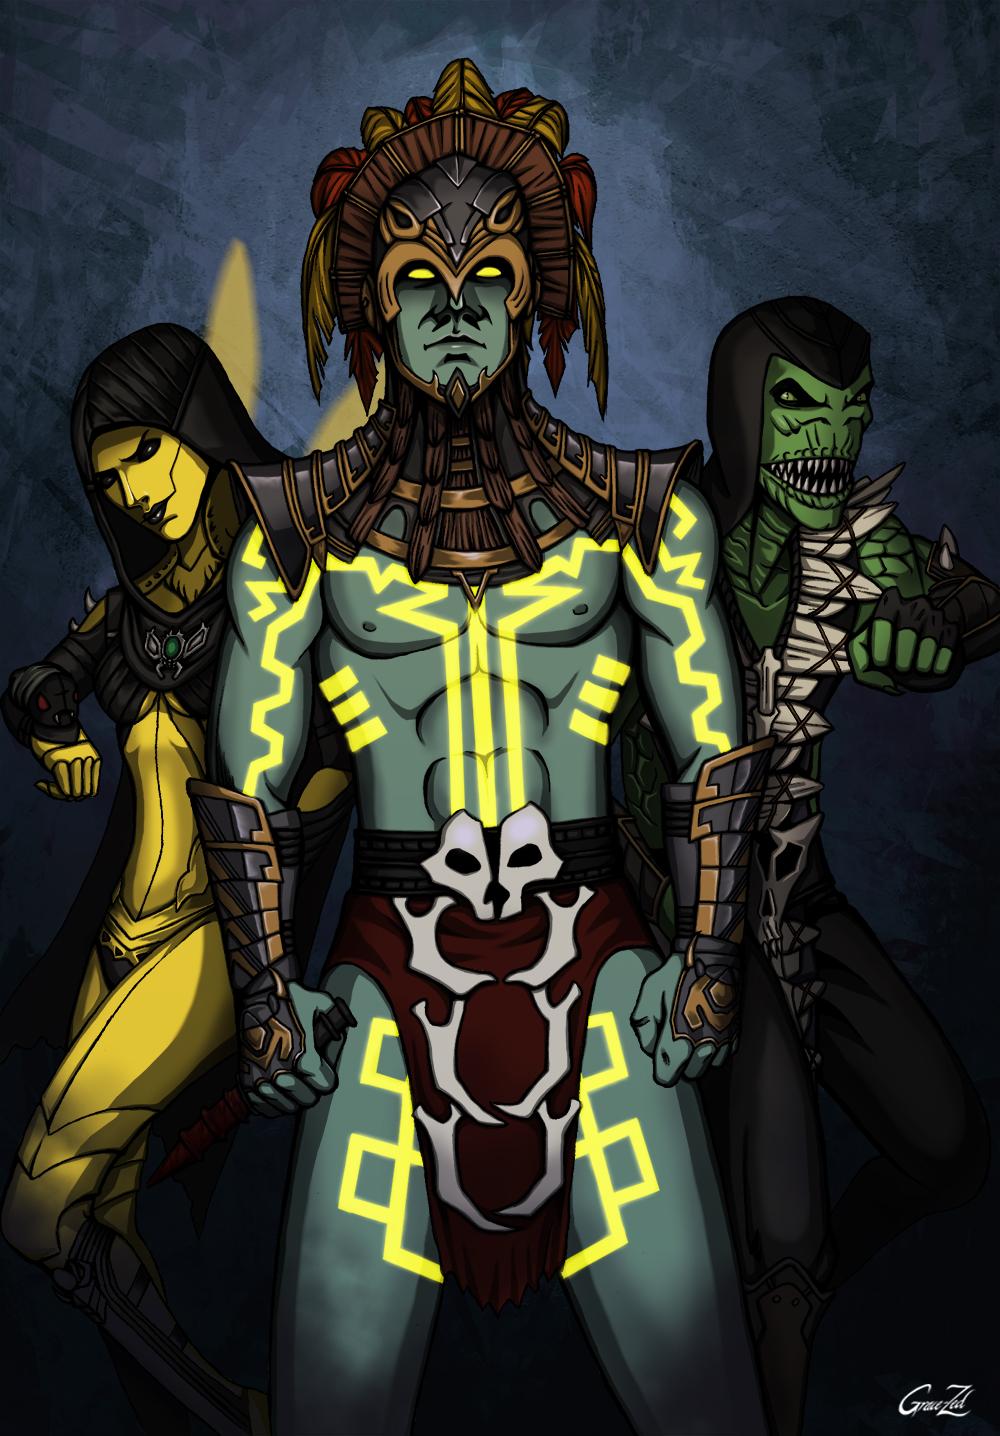 MKX Dvorah vs Scorpion by Grace-Zed on DeviantArt